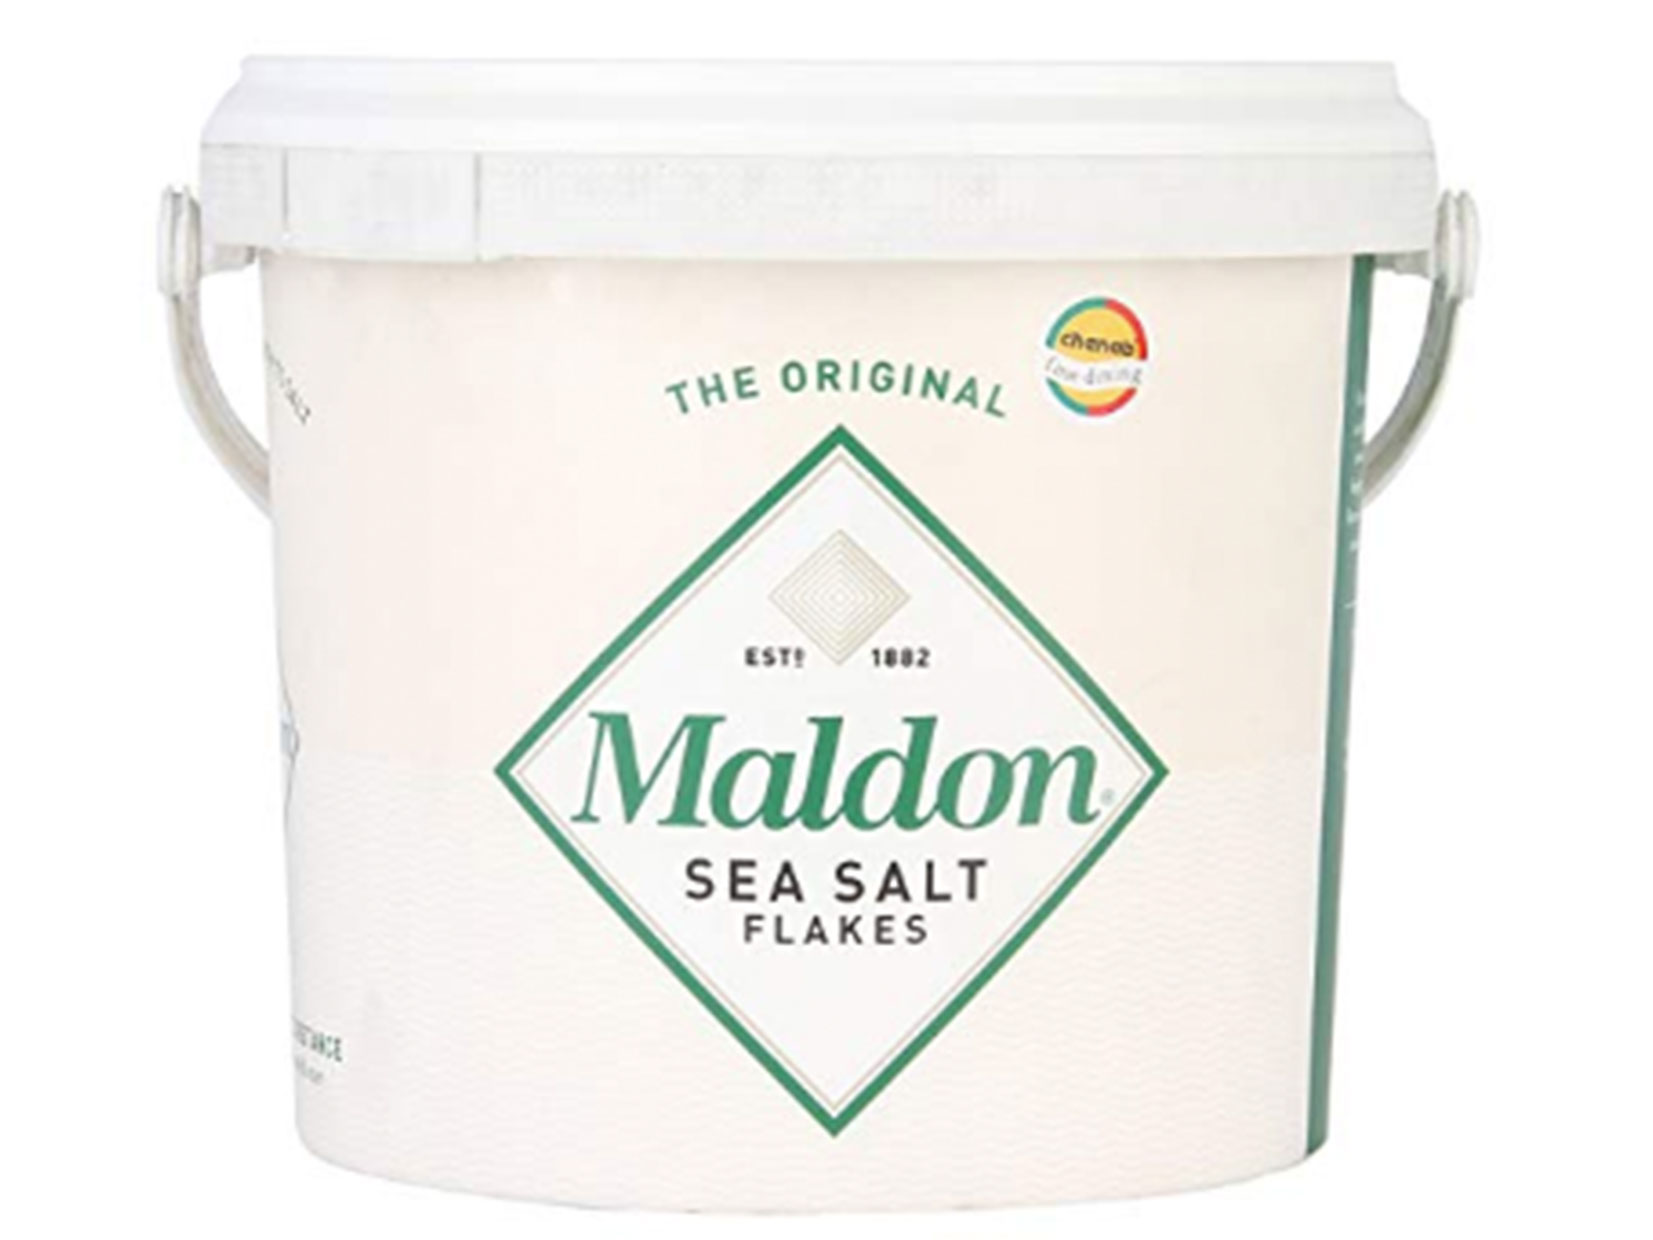 You Can Buy a 3-Pound Bucket of Maldon Salt